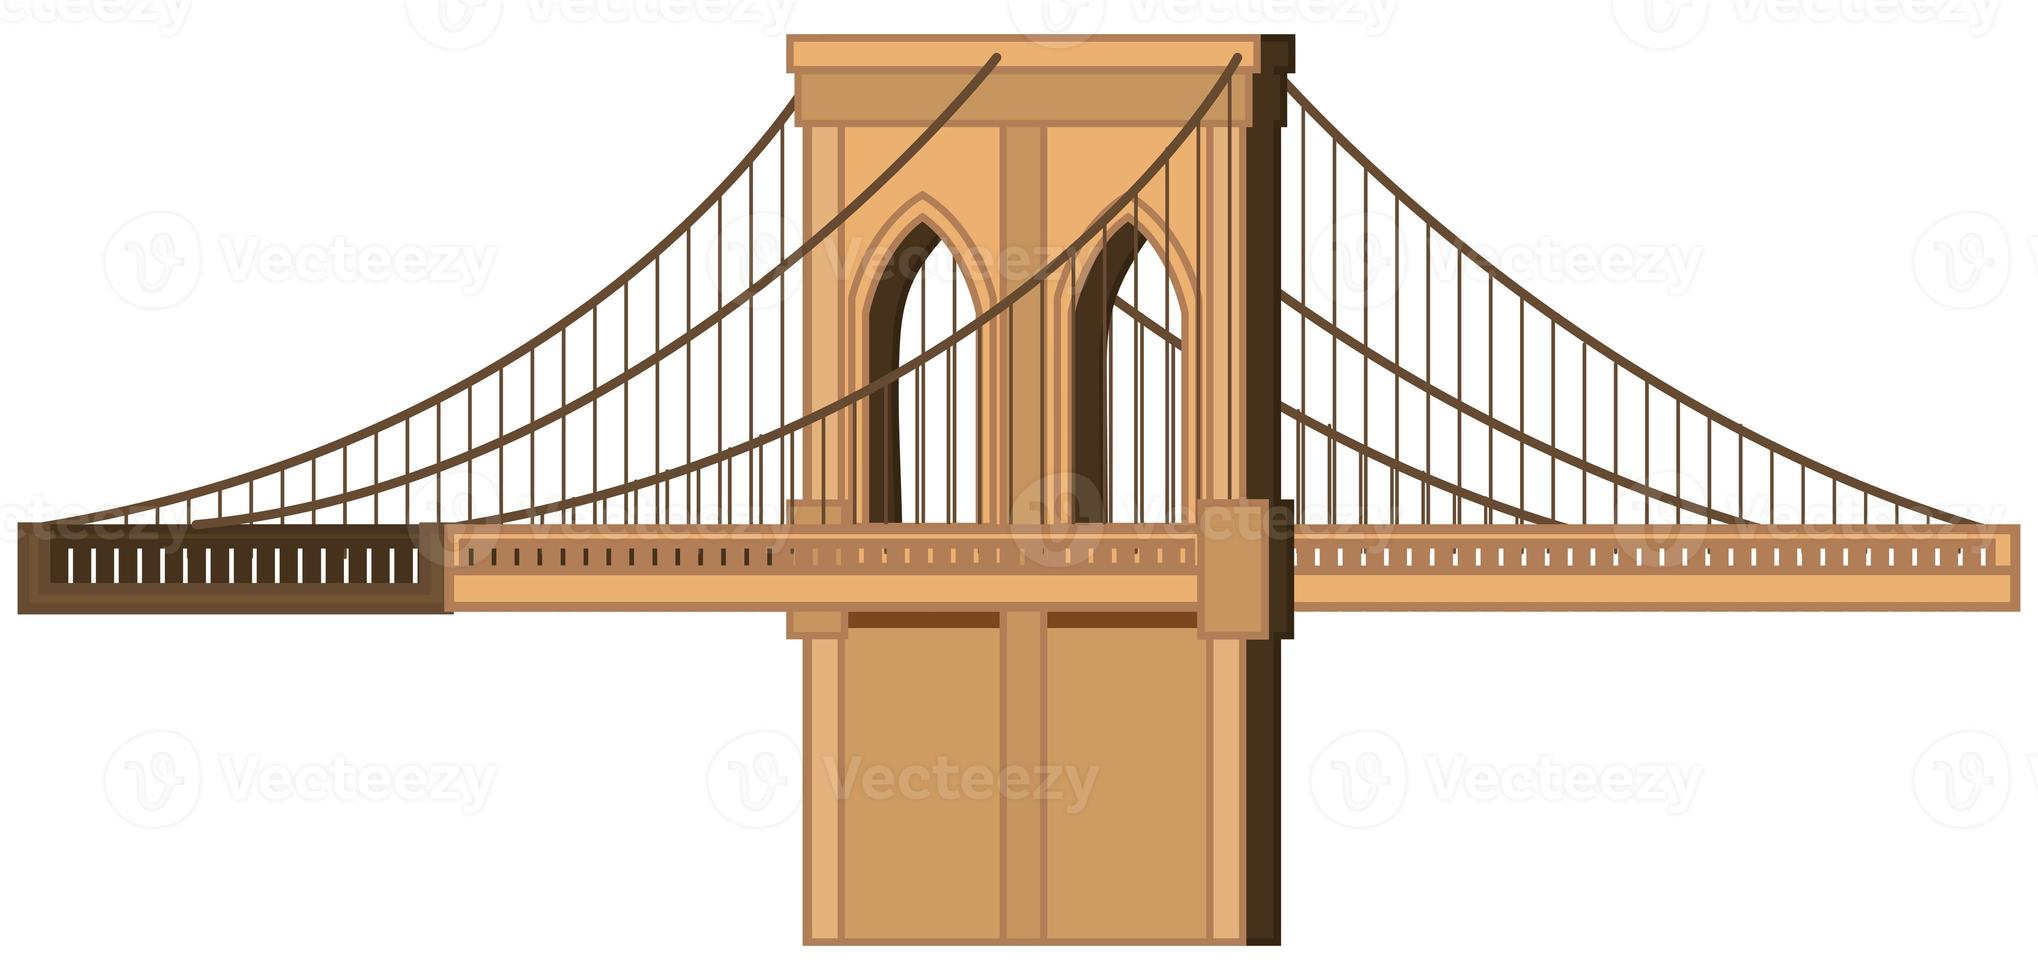 stor bro på vit bakgrund foto